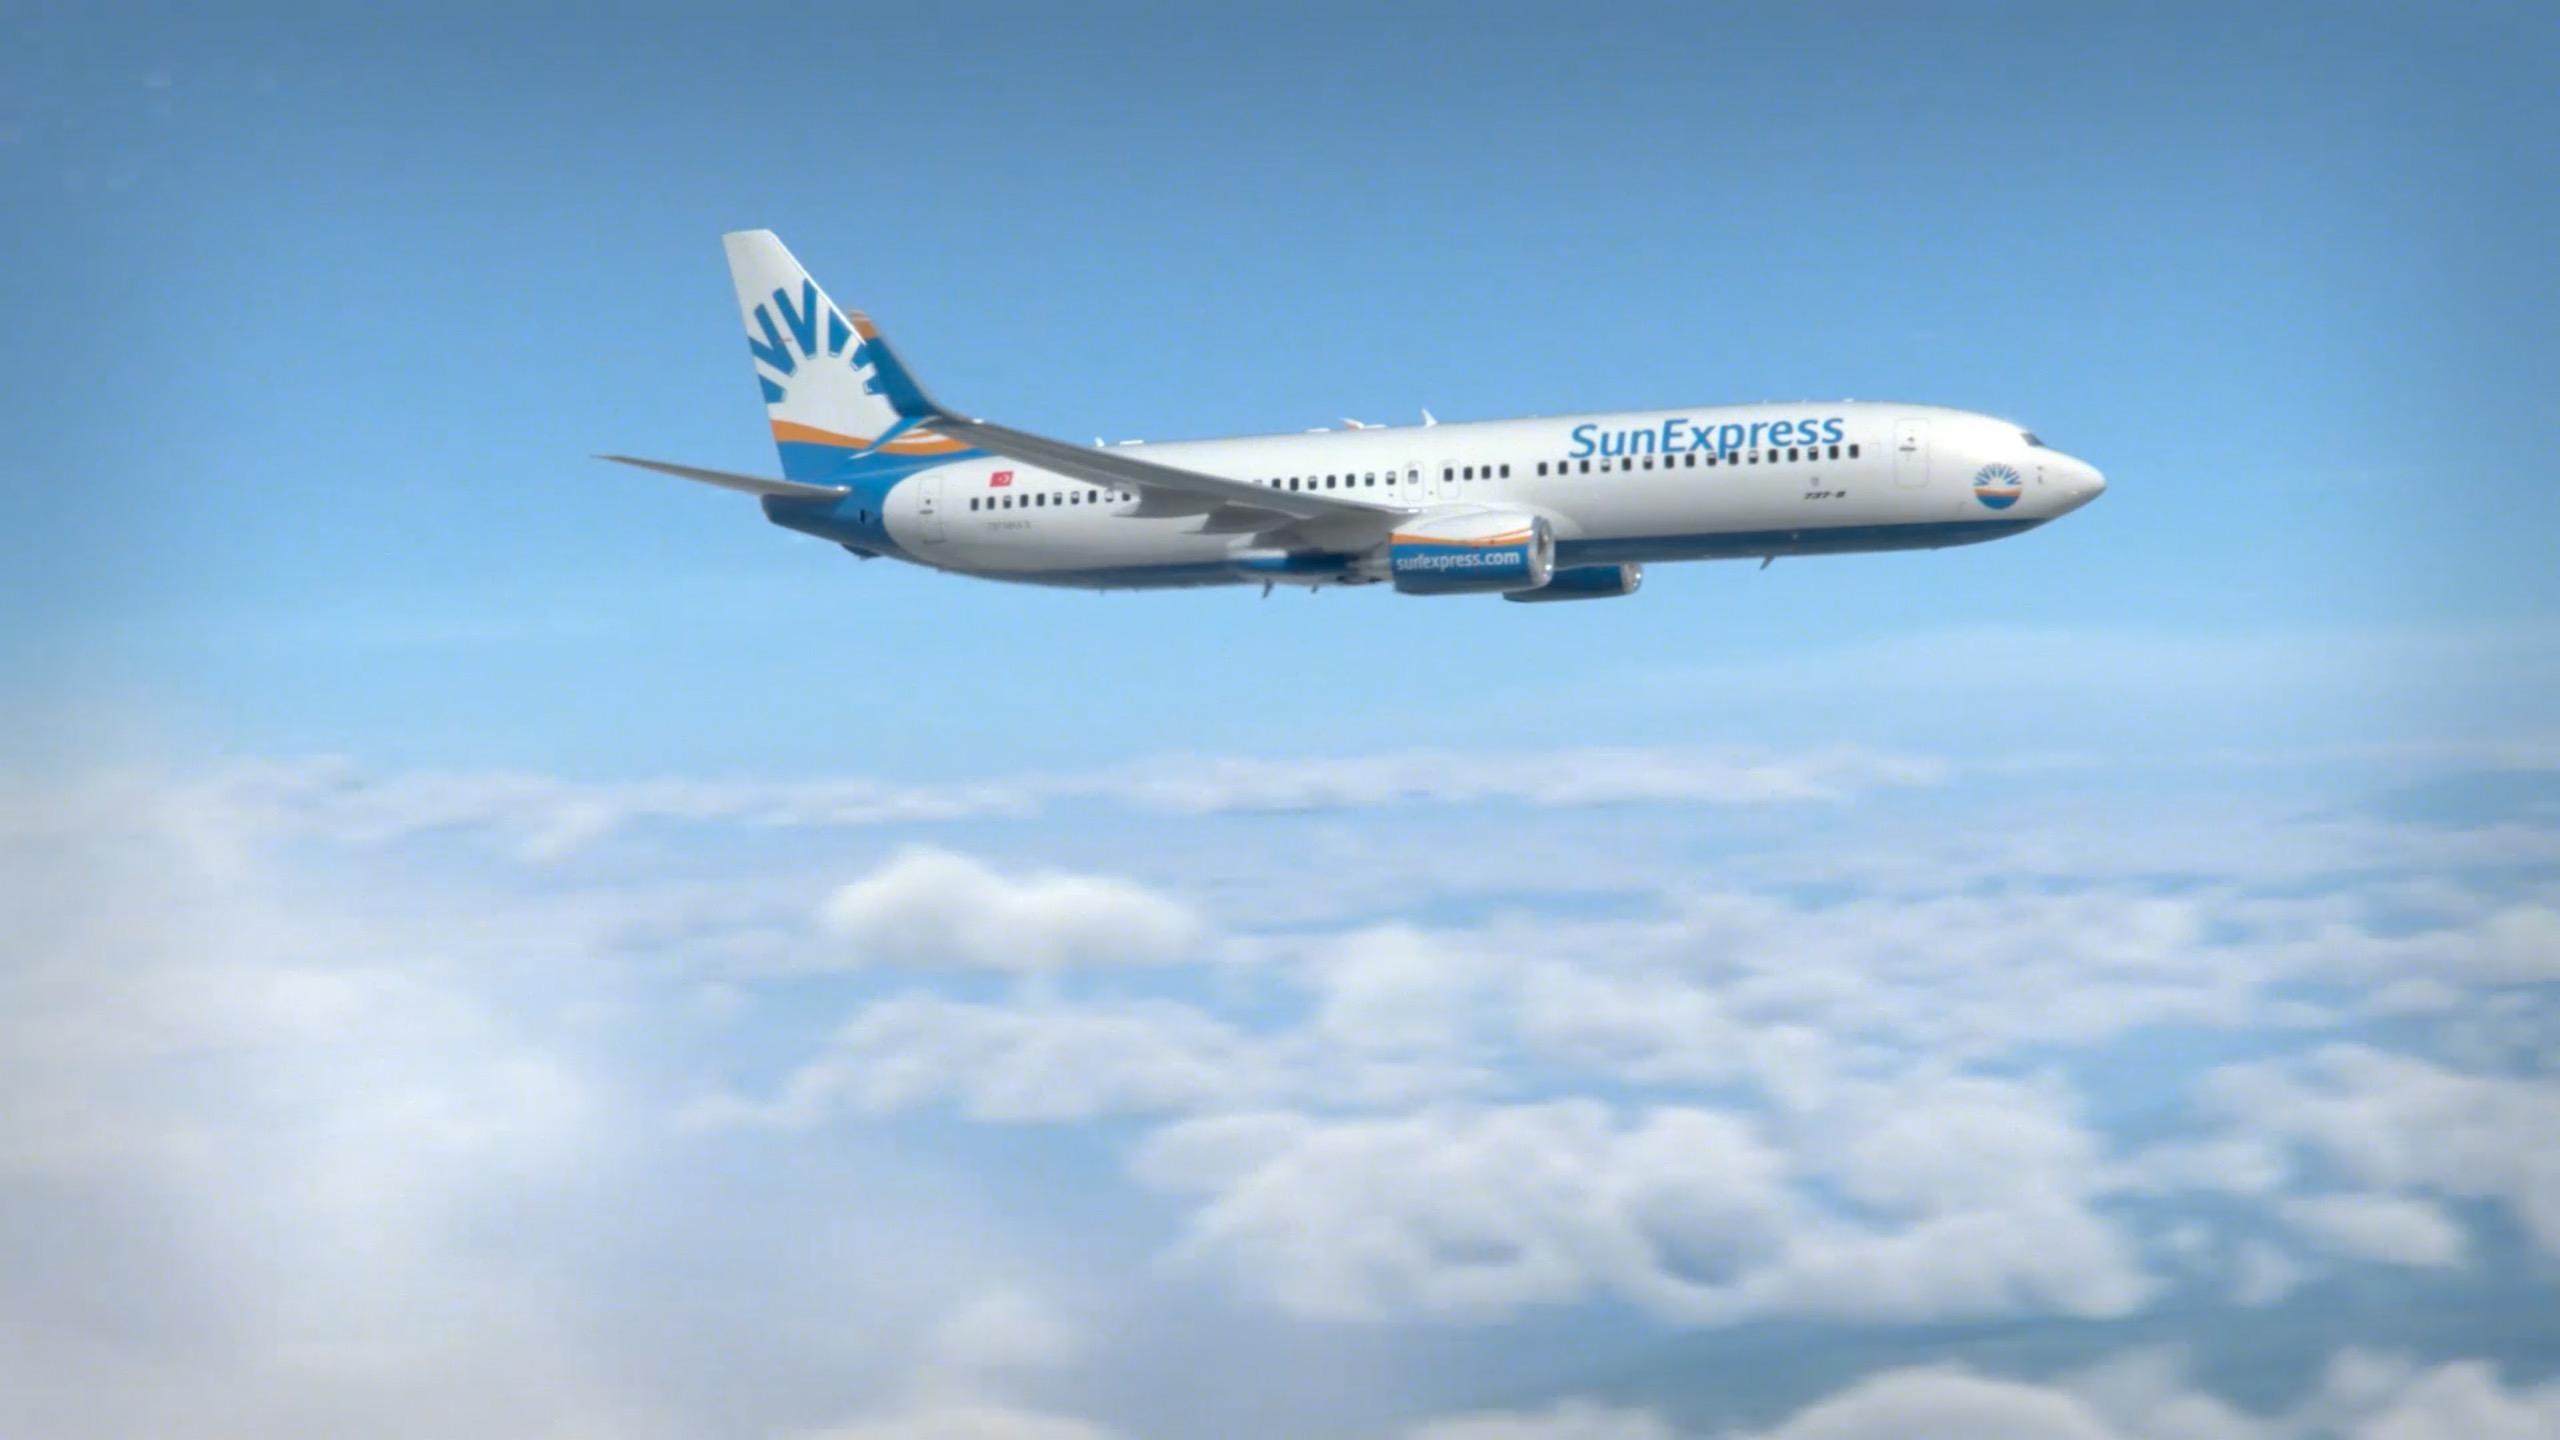 SunExpress aircraft above clouds